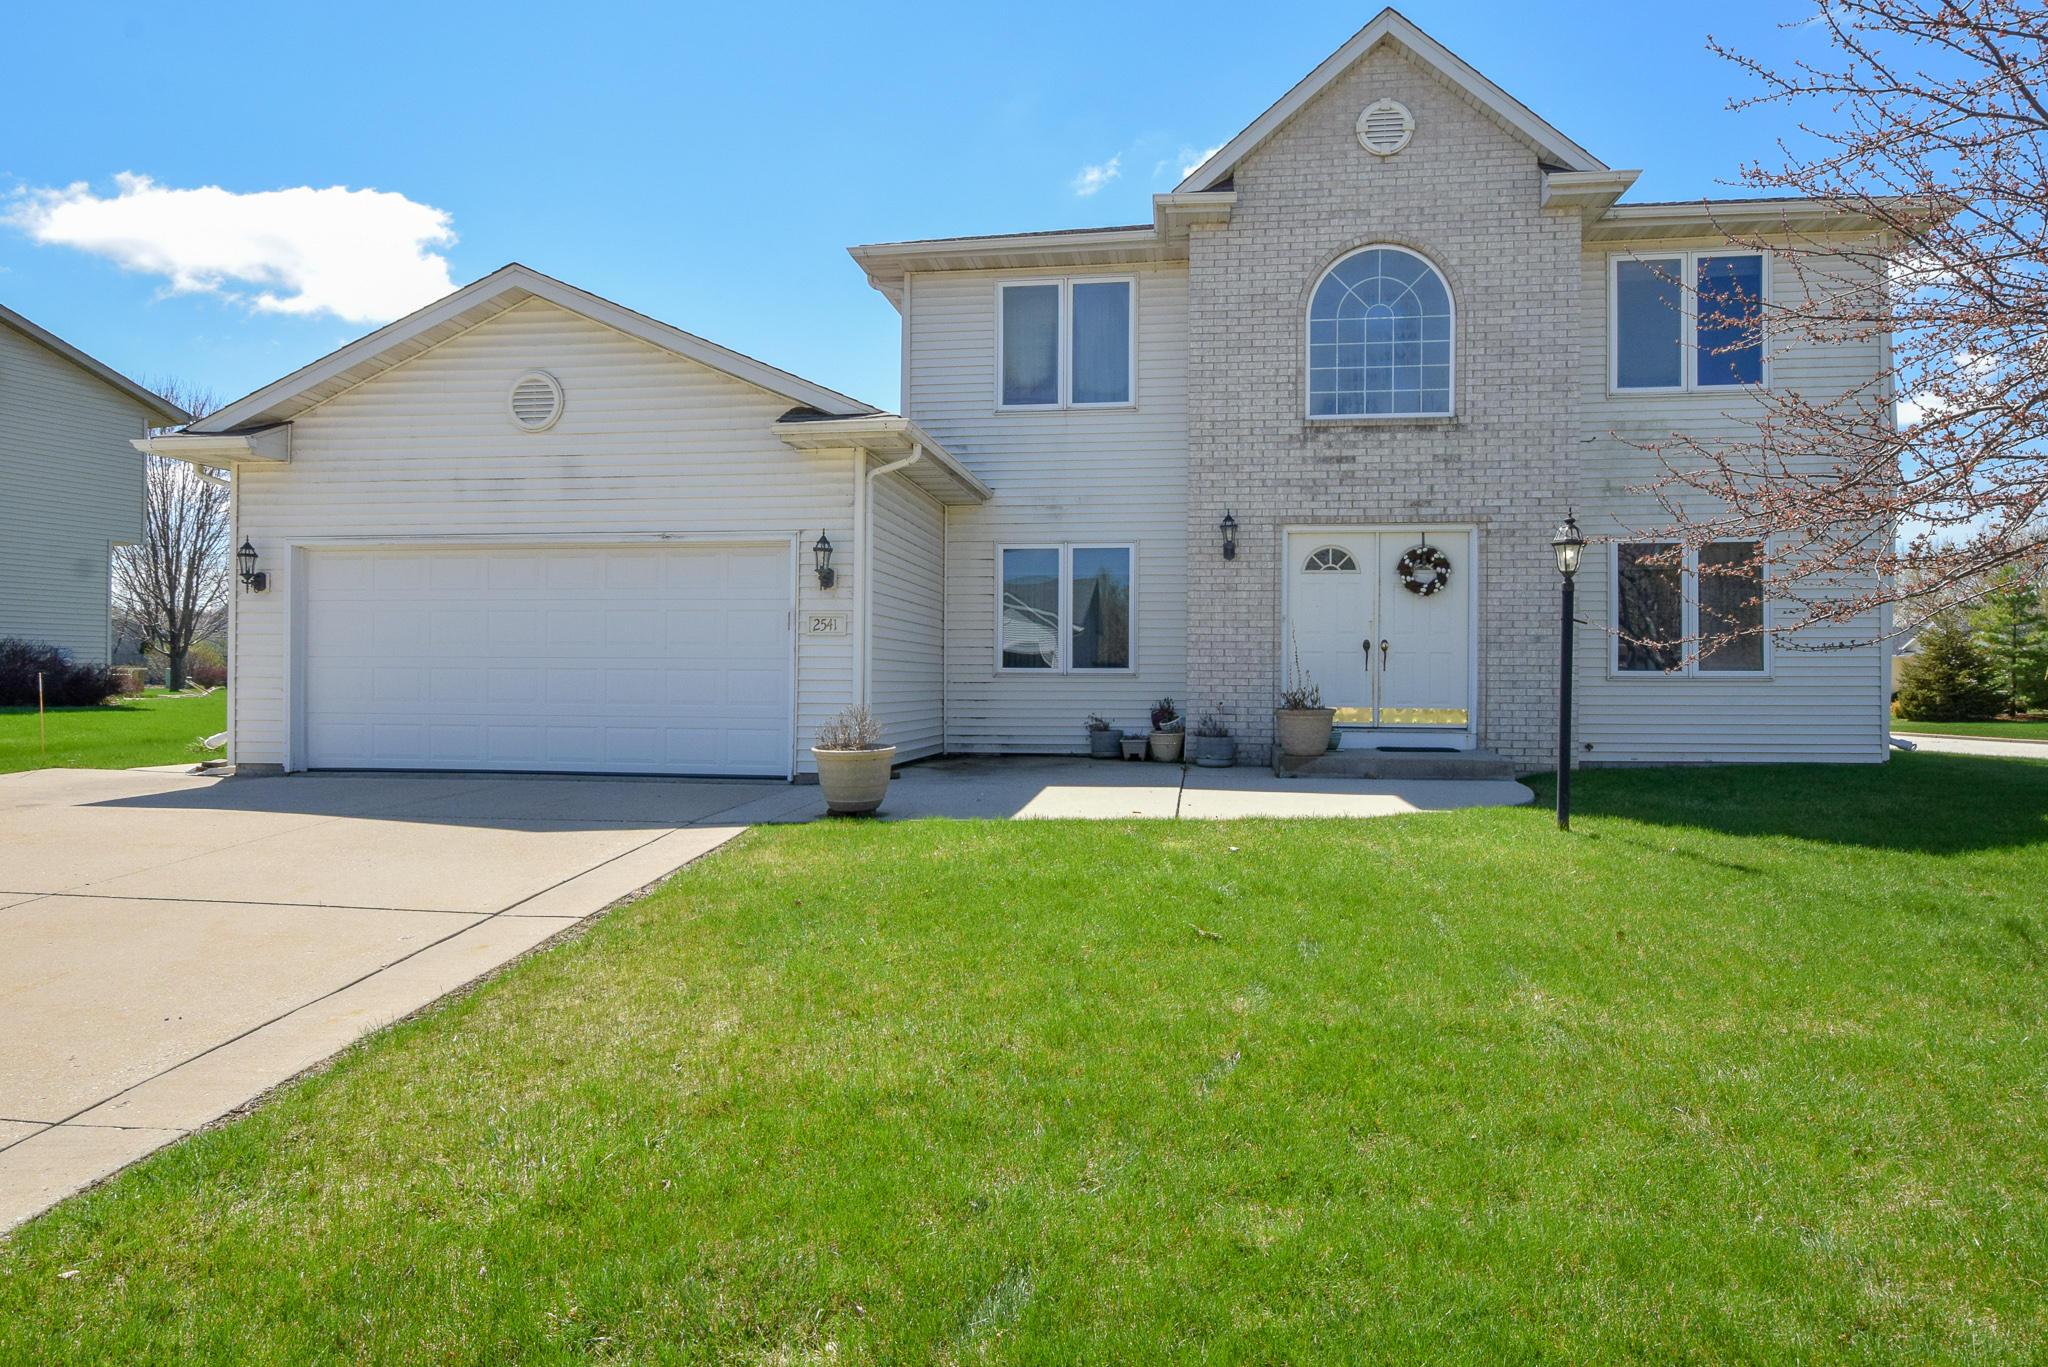 2541 Emslie Dr, Waukesha, Wisconsin 53188, 3 Bedrooms Bedrooms, 7 Rooms Rooms,2 BathroomsBathrooms,Single-Family,For Sale,Emslie Dr,1633766